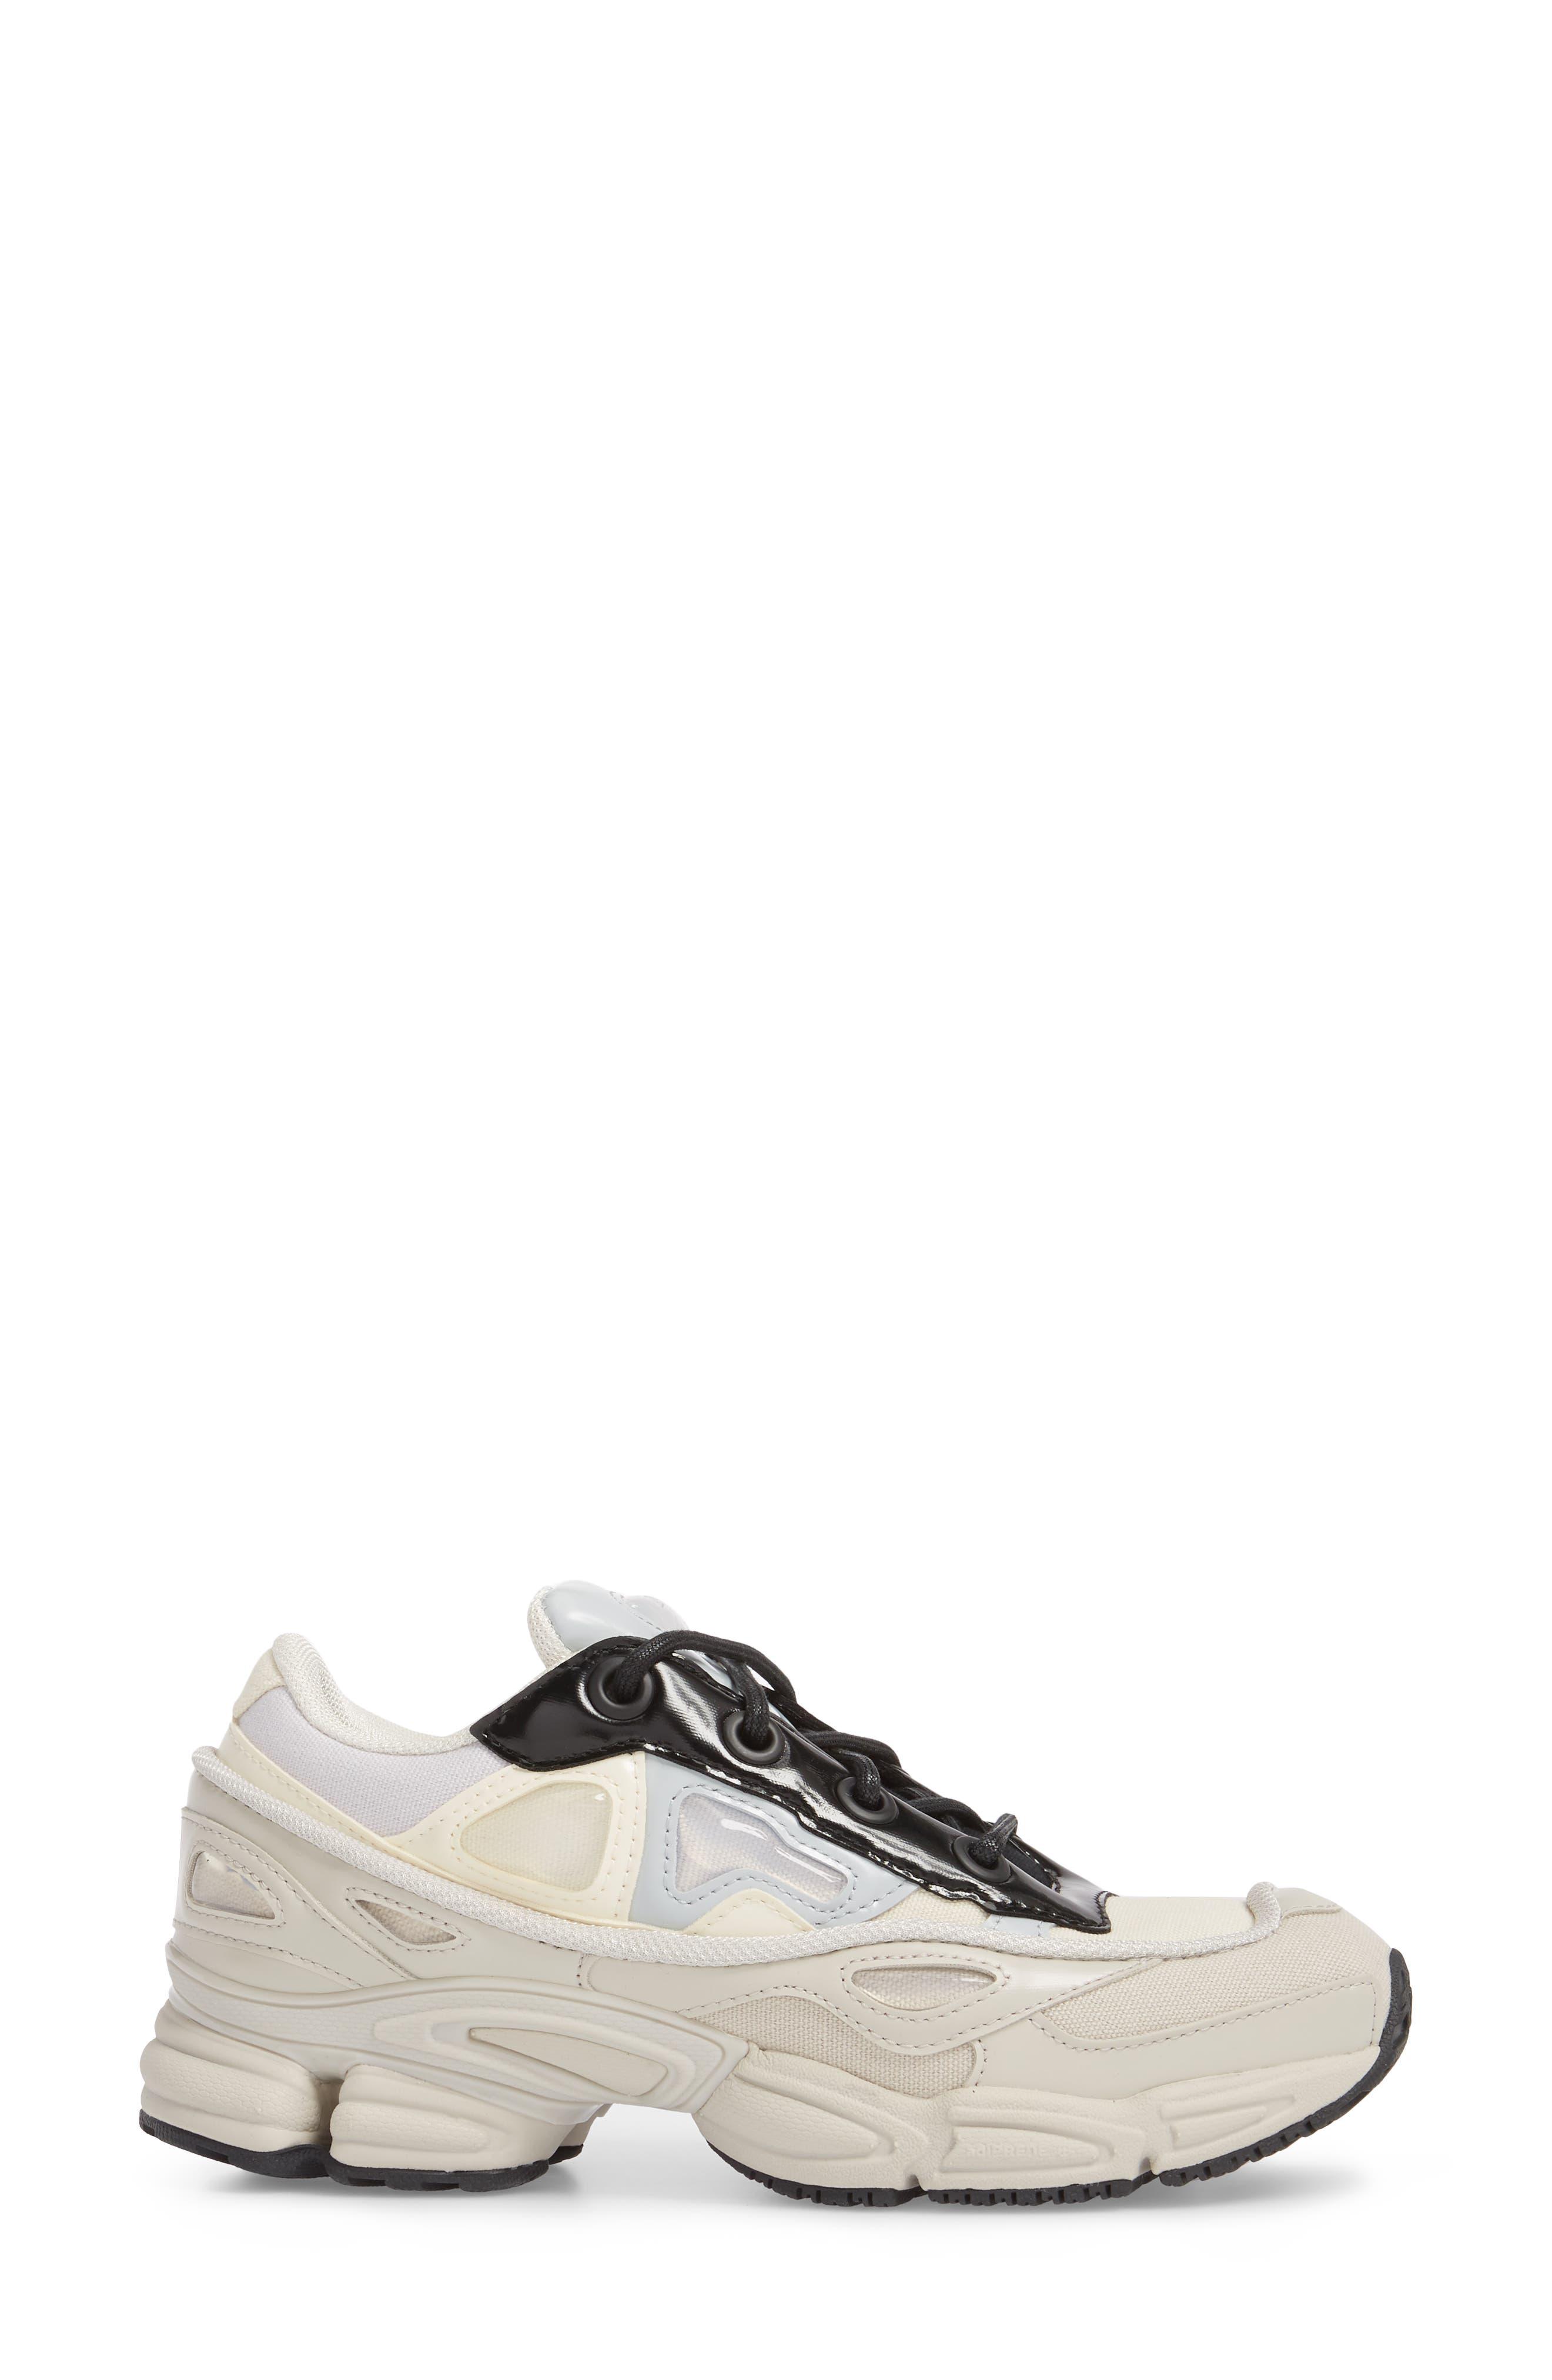 adidas by Raf Simons Ozweego III Sneaker,                             Alternate thumbnail 3, color,                             Cream White/ Mist Stone/ Black